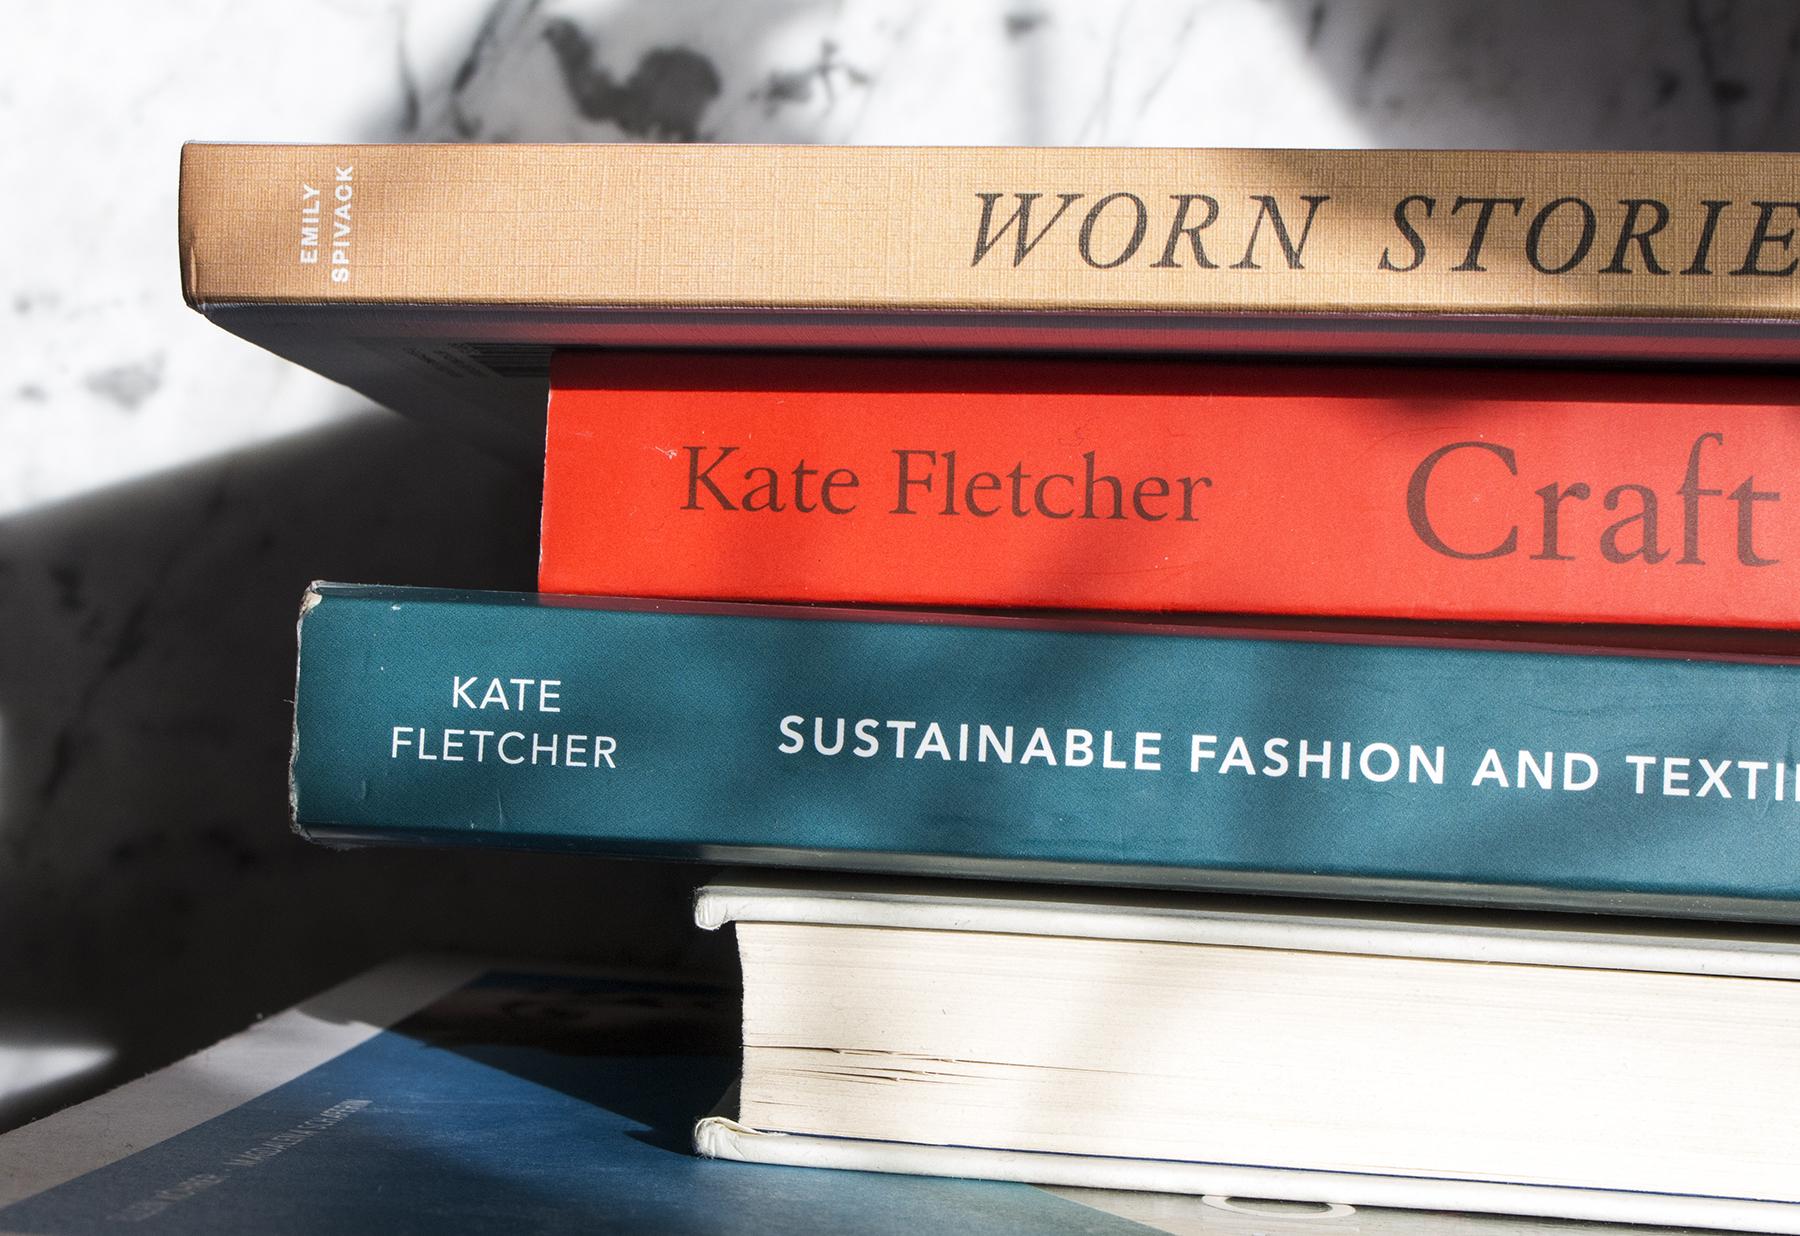 The Best Sustainable Fashion Books Lissome Magazine